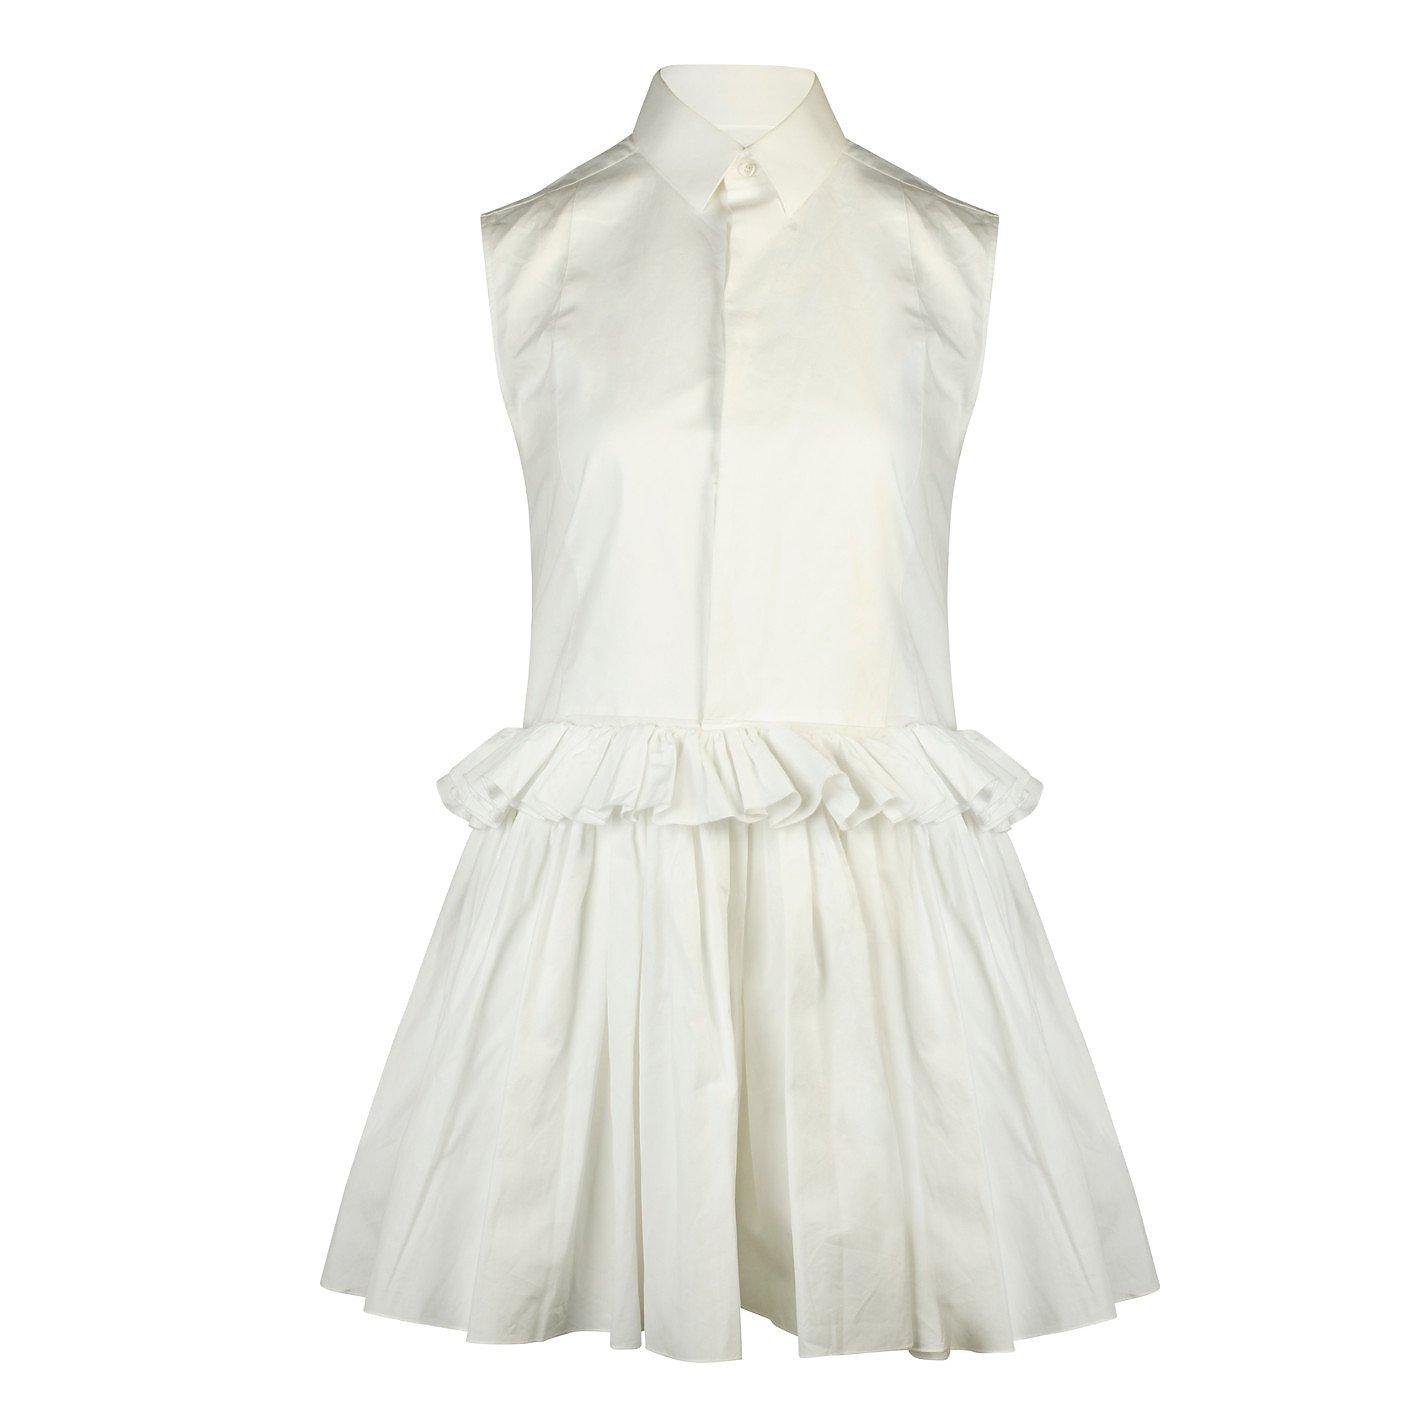 DOLCE & GABBANA Sleeveless Ruffle Mini Shirt Dress